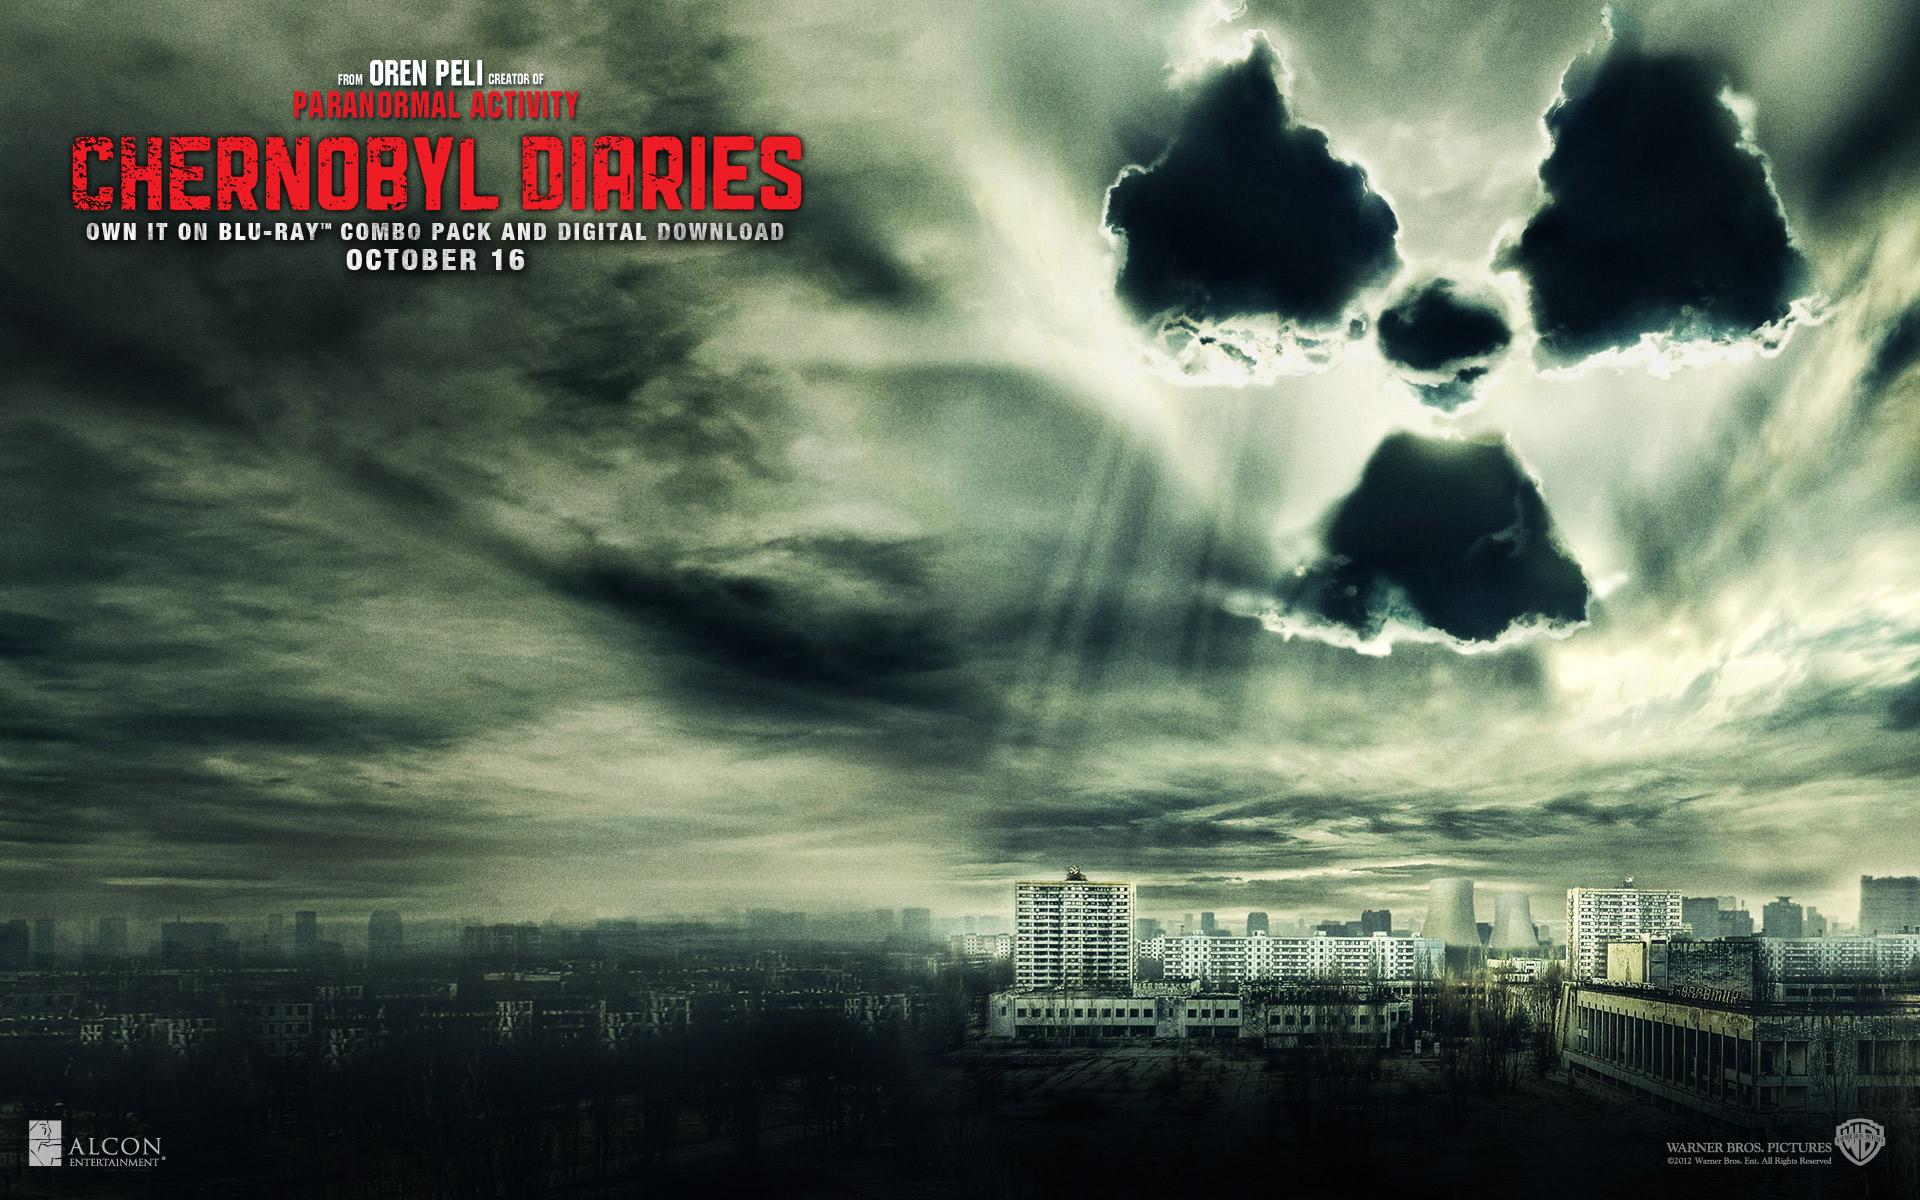 Chernobyl Diaries wallpaper 2